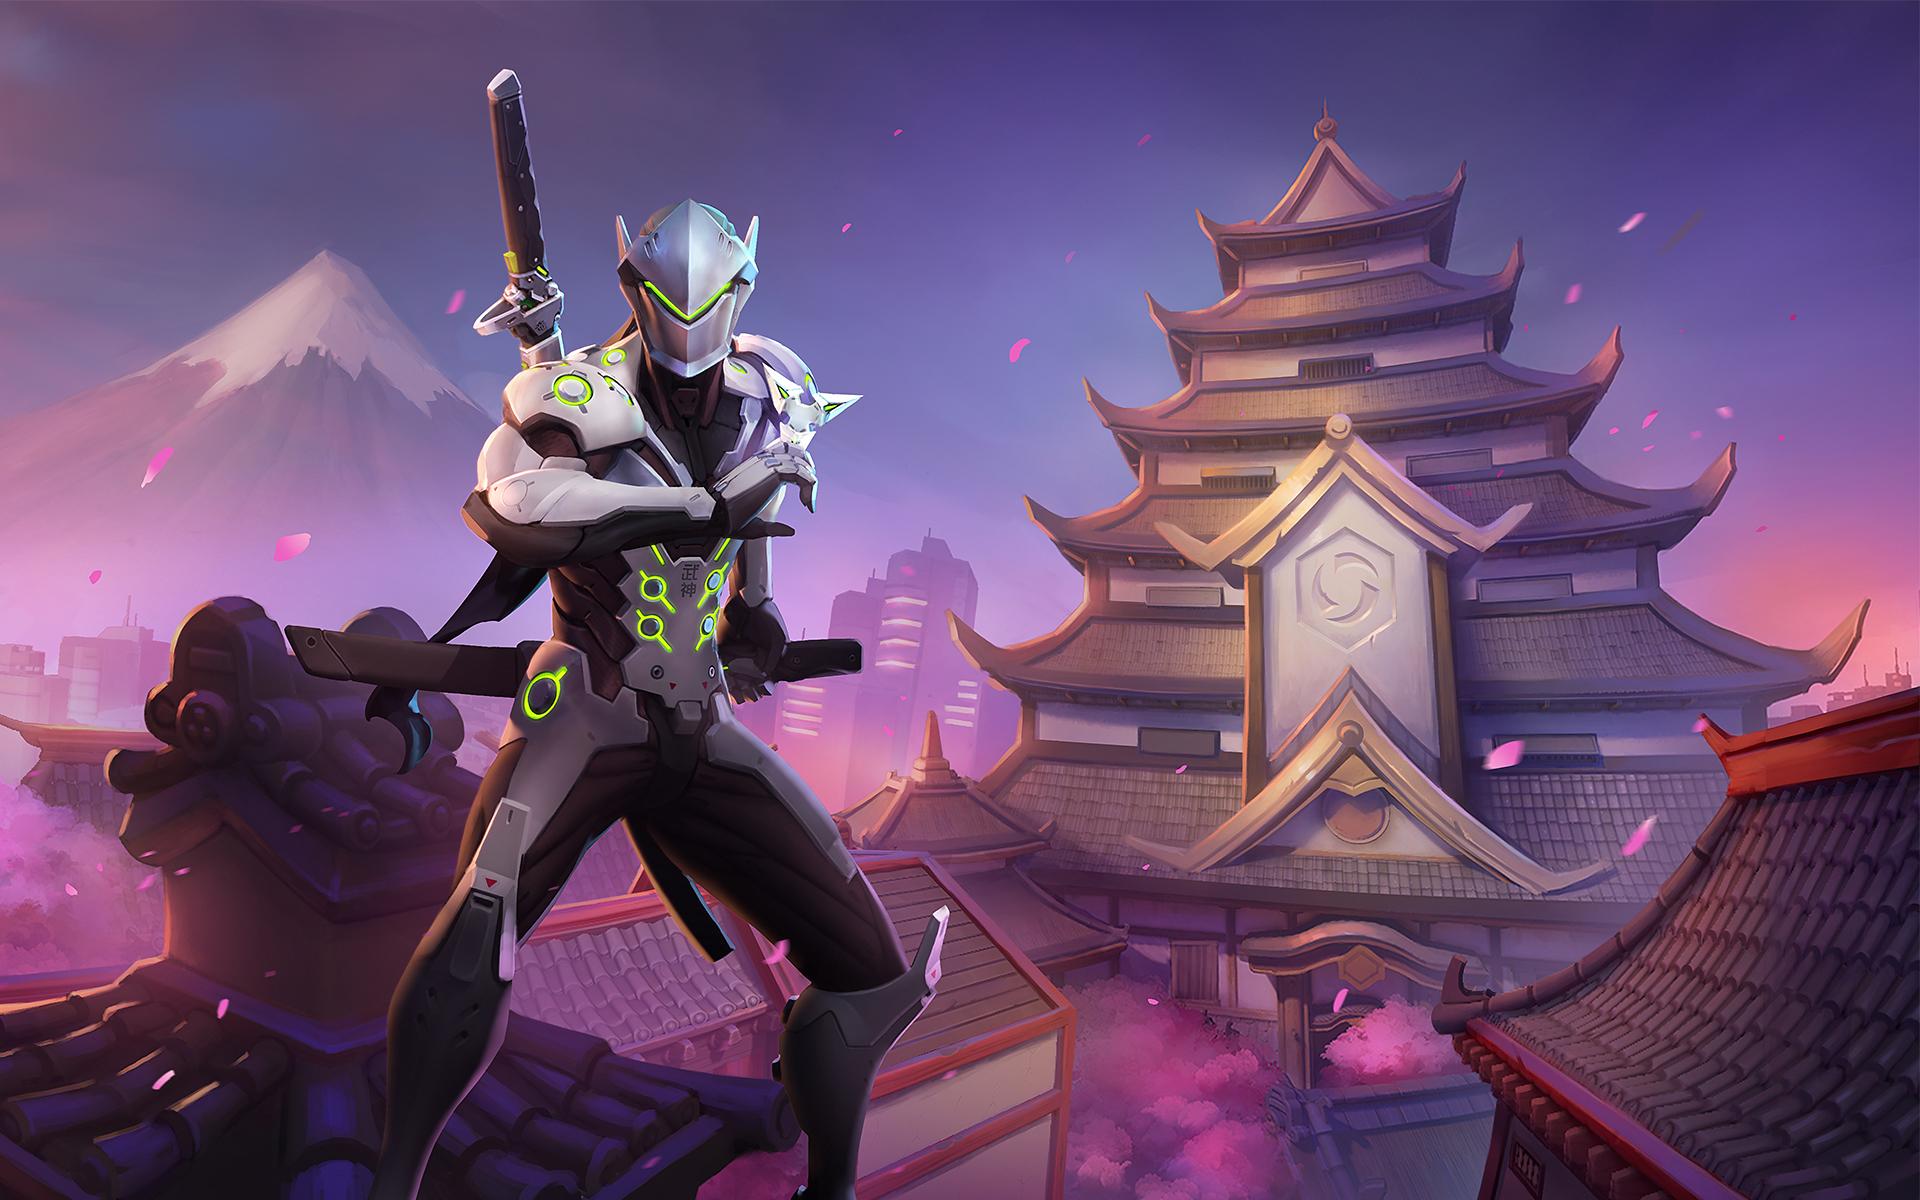 Heroes Of The Storm Wallpaper 025 Genji